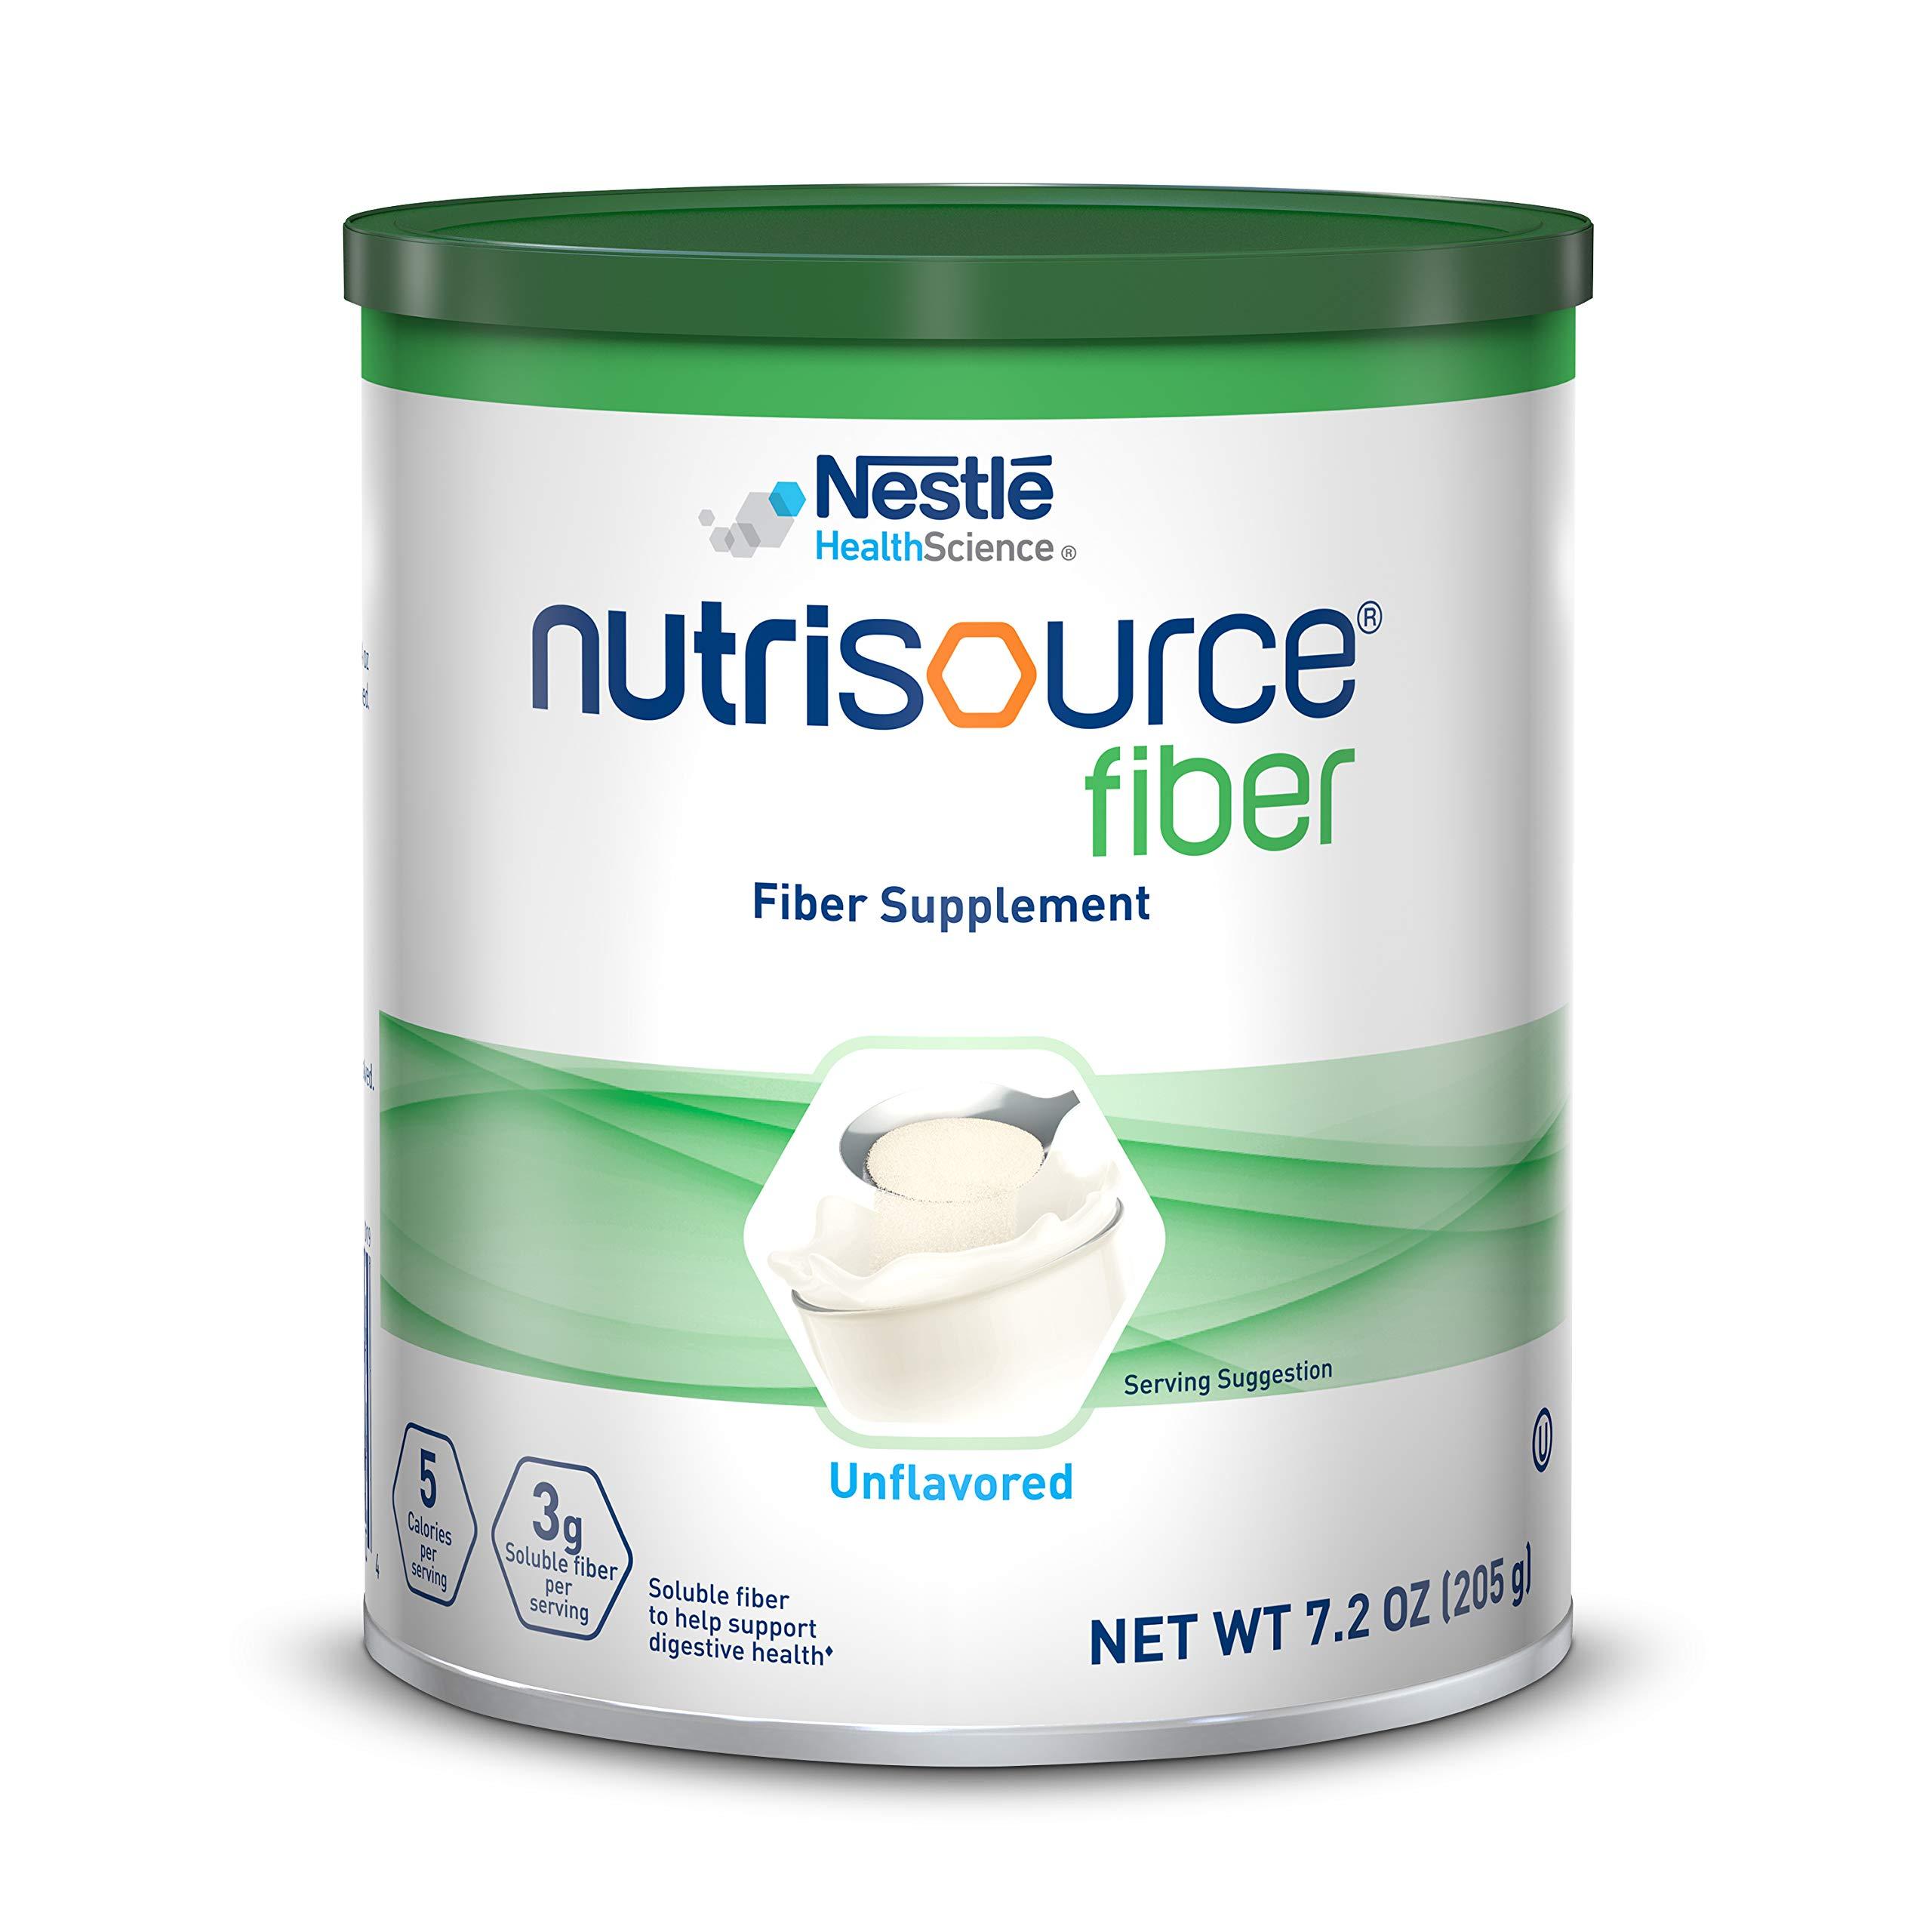 NutriSource Fiber Supplement Powder, Unflavored, 7.2 oz Canister, (Pack of 4) by Nutrisource